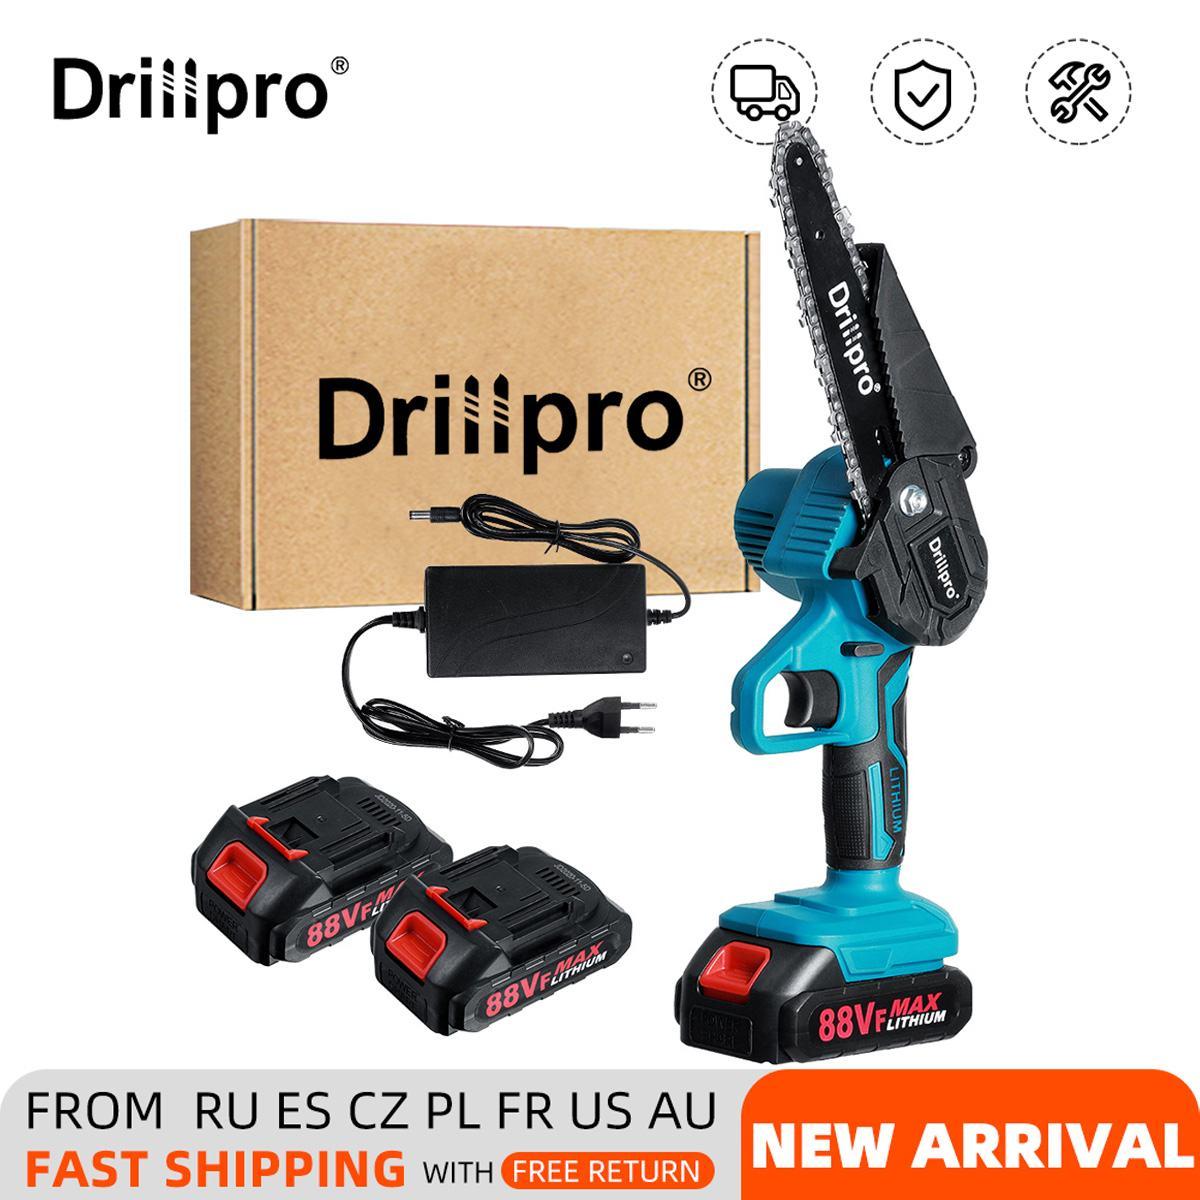 Drillpro 6 بوصة منشار كهربائي لاسلكي تشذيب المنشار حديقة شجرة تسجيل التشذيب المنشار أدوات كهربائية لبطارية Makiita 18 فولت